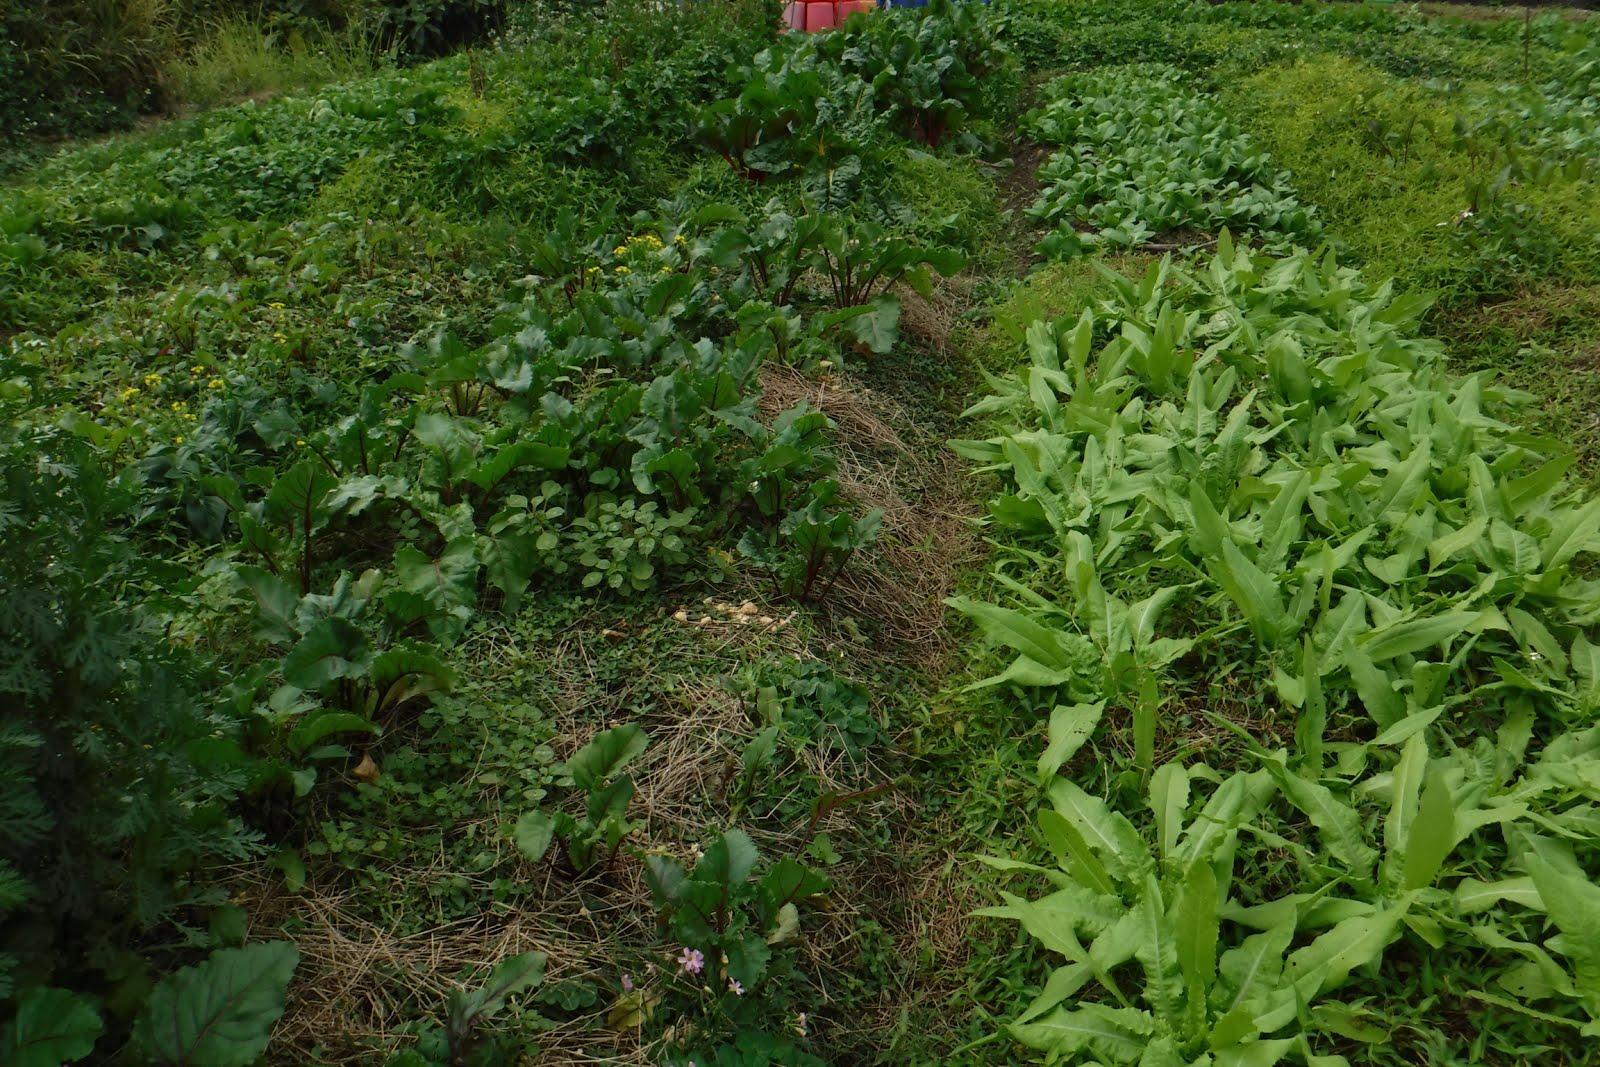 鄭立勳 。常滿。 Mandy Cheng: Vegetable farm visit in Hong Kong. Soil Farm 鄉土學社